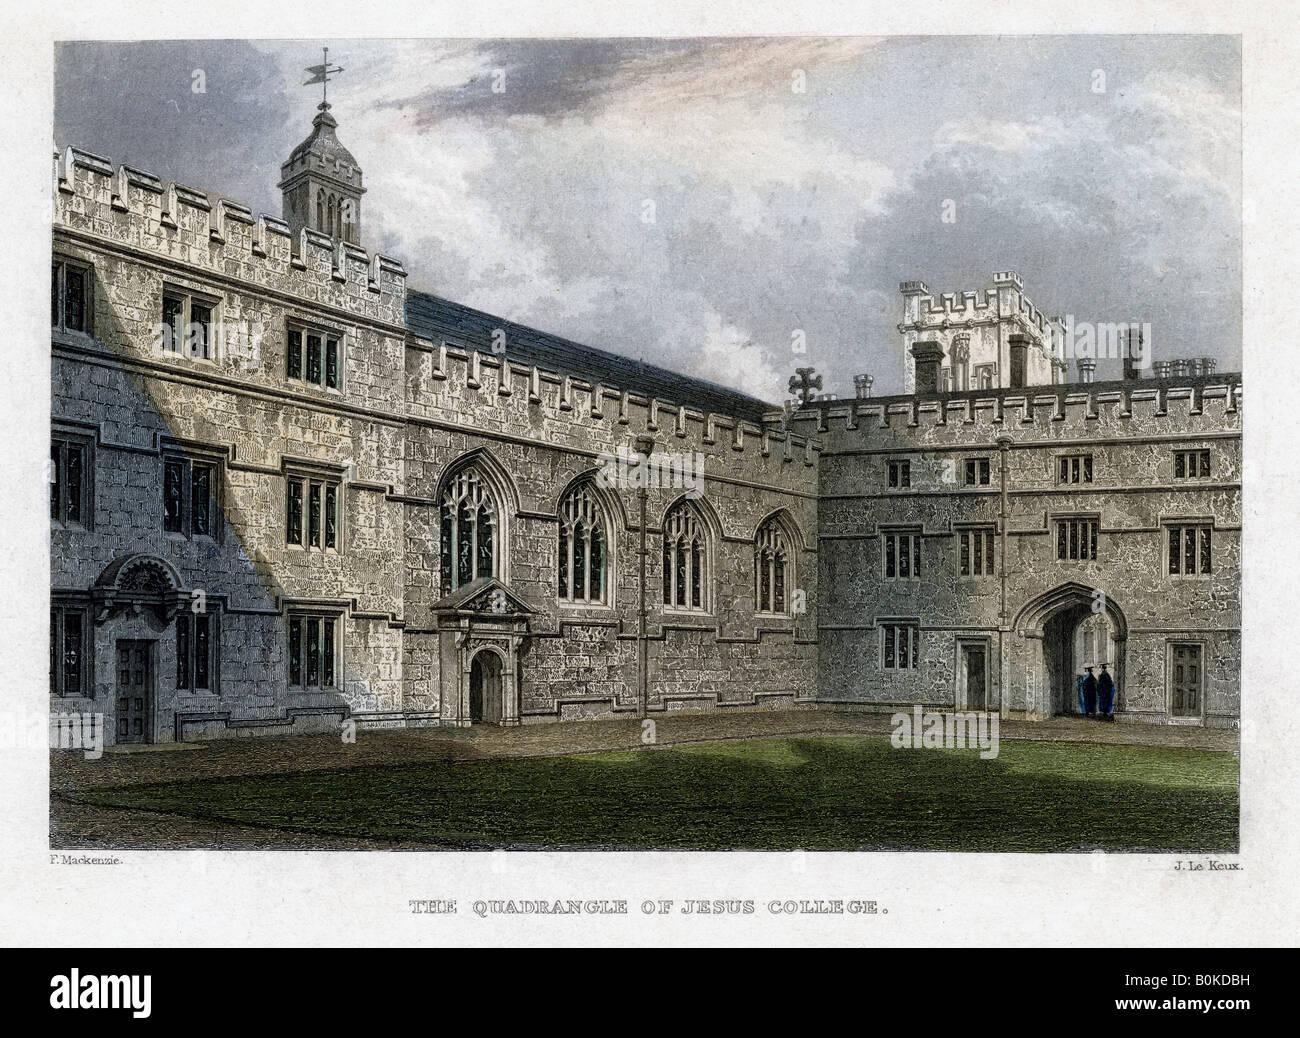 The Quadrangle of Jesus College, Oxford University, c1830s. Artist: John Le Keux - Stock Image